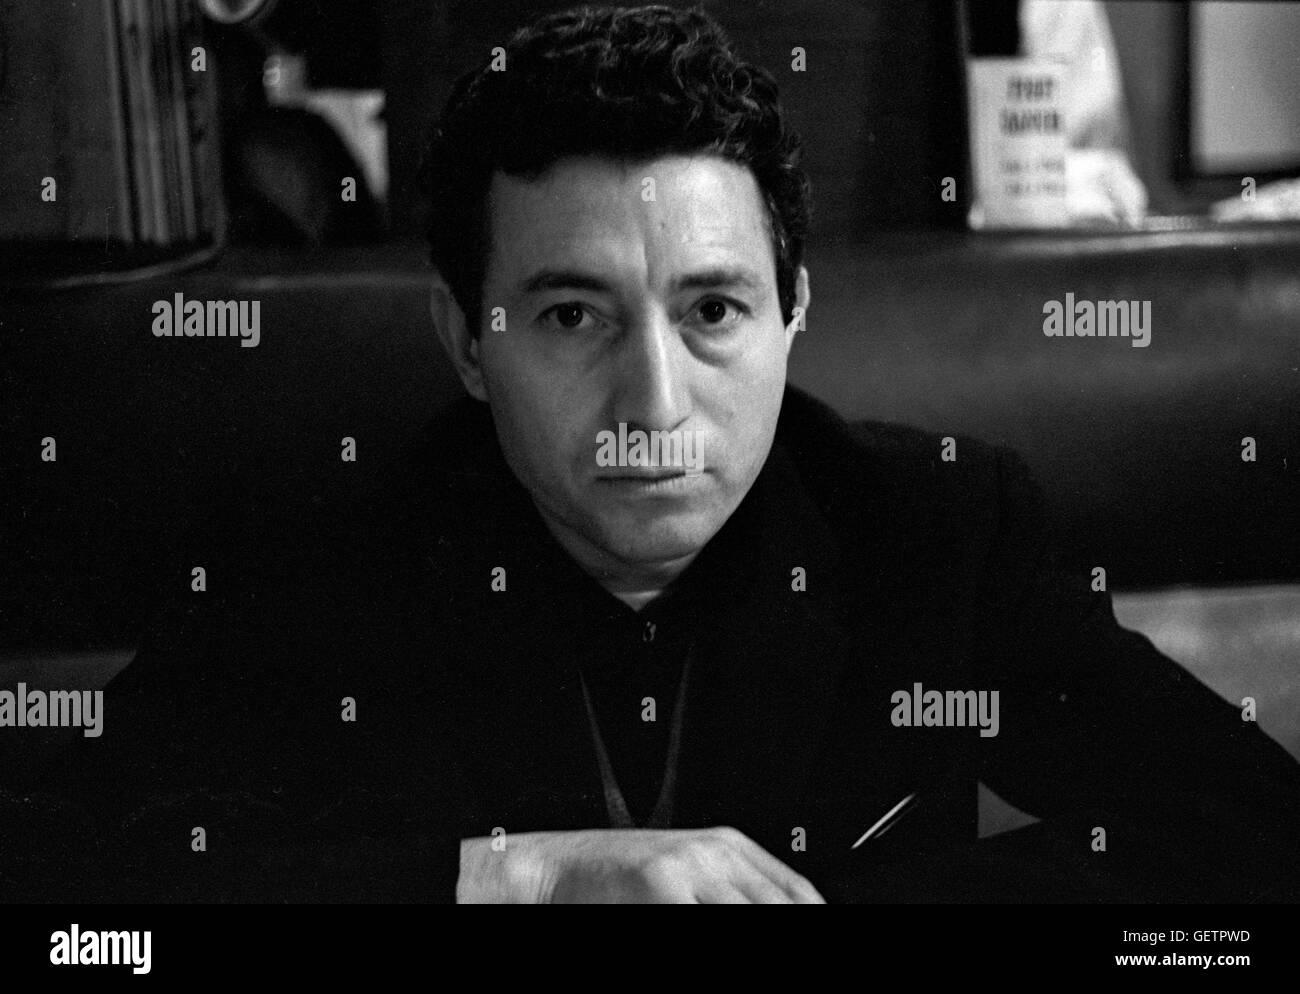 Tony Vaccaro, photographer - Stock Image